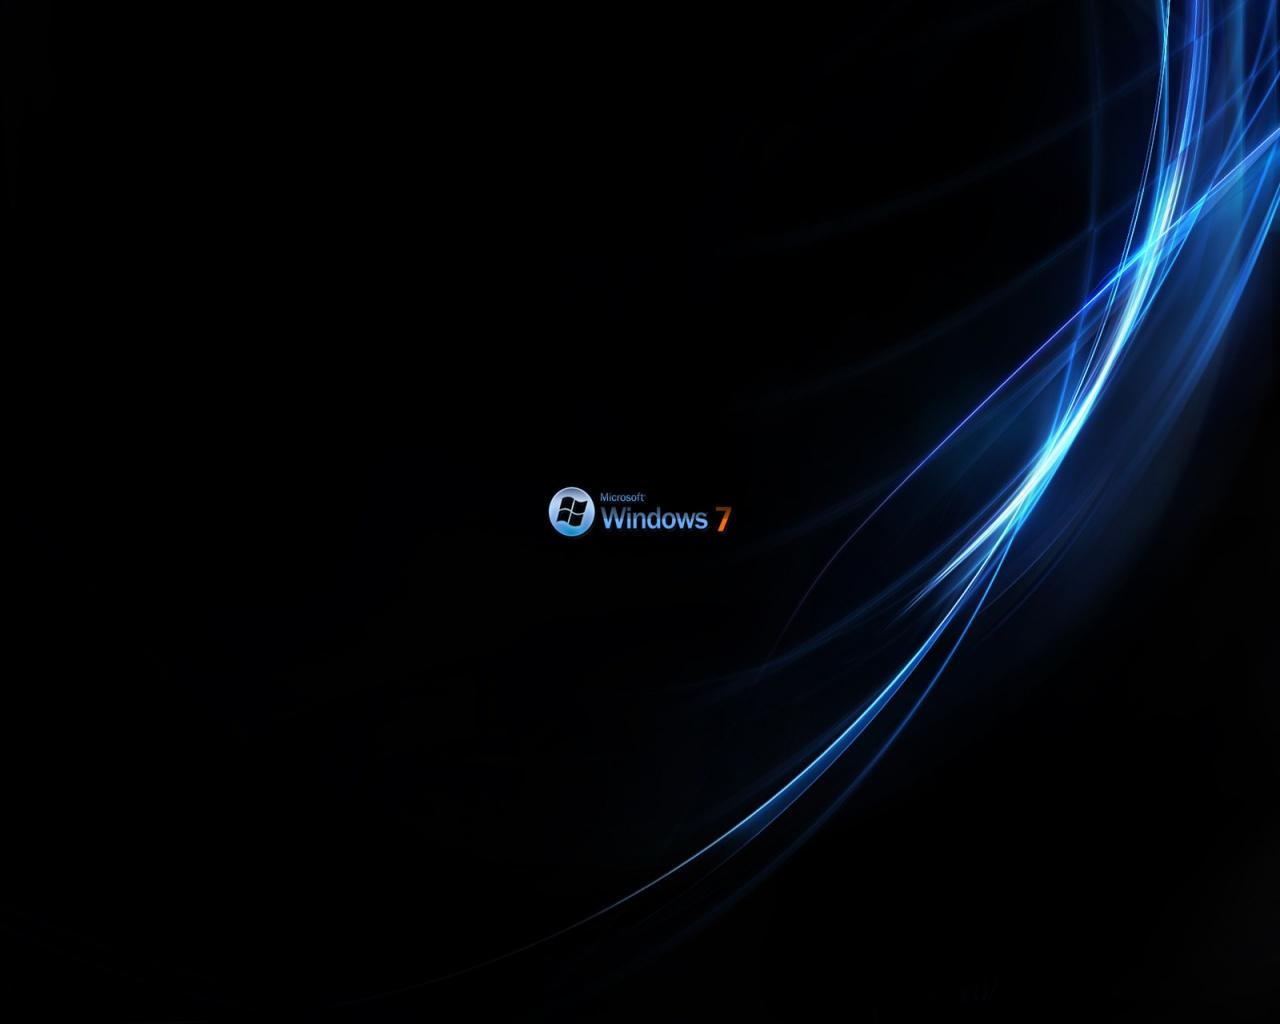 1280x1024 Orange Windows 7 desktop PC and Mac wallpaper 1280x1024